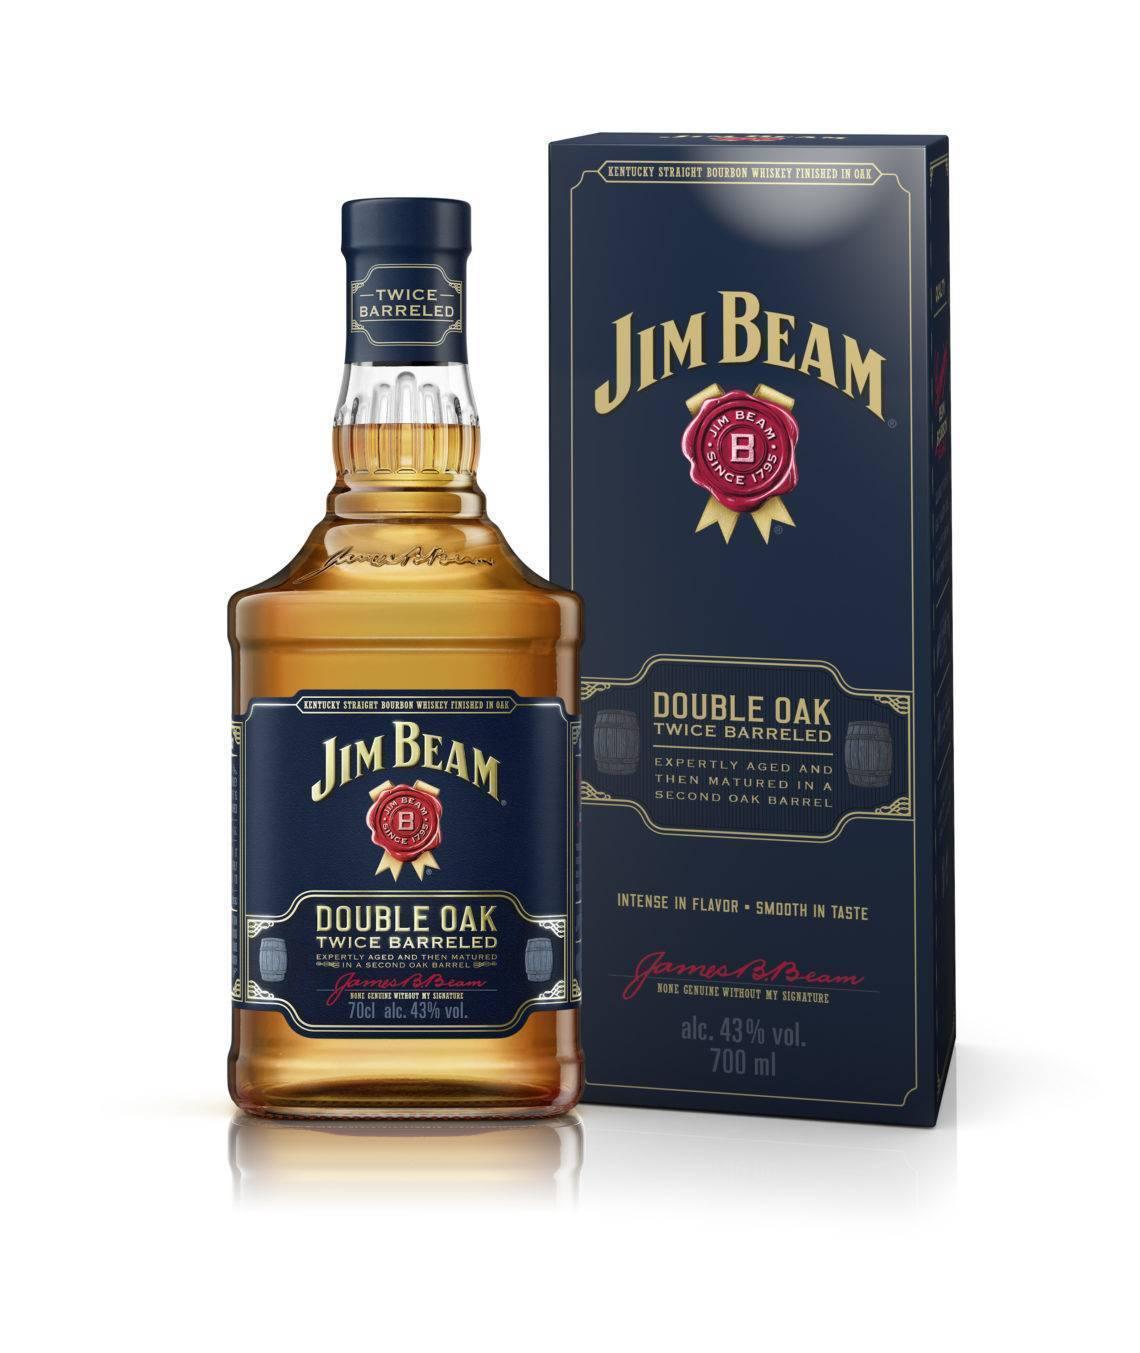 Jim-beam-double-oak обзор виски, дегустационные характеристики